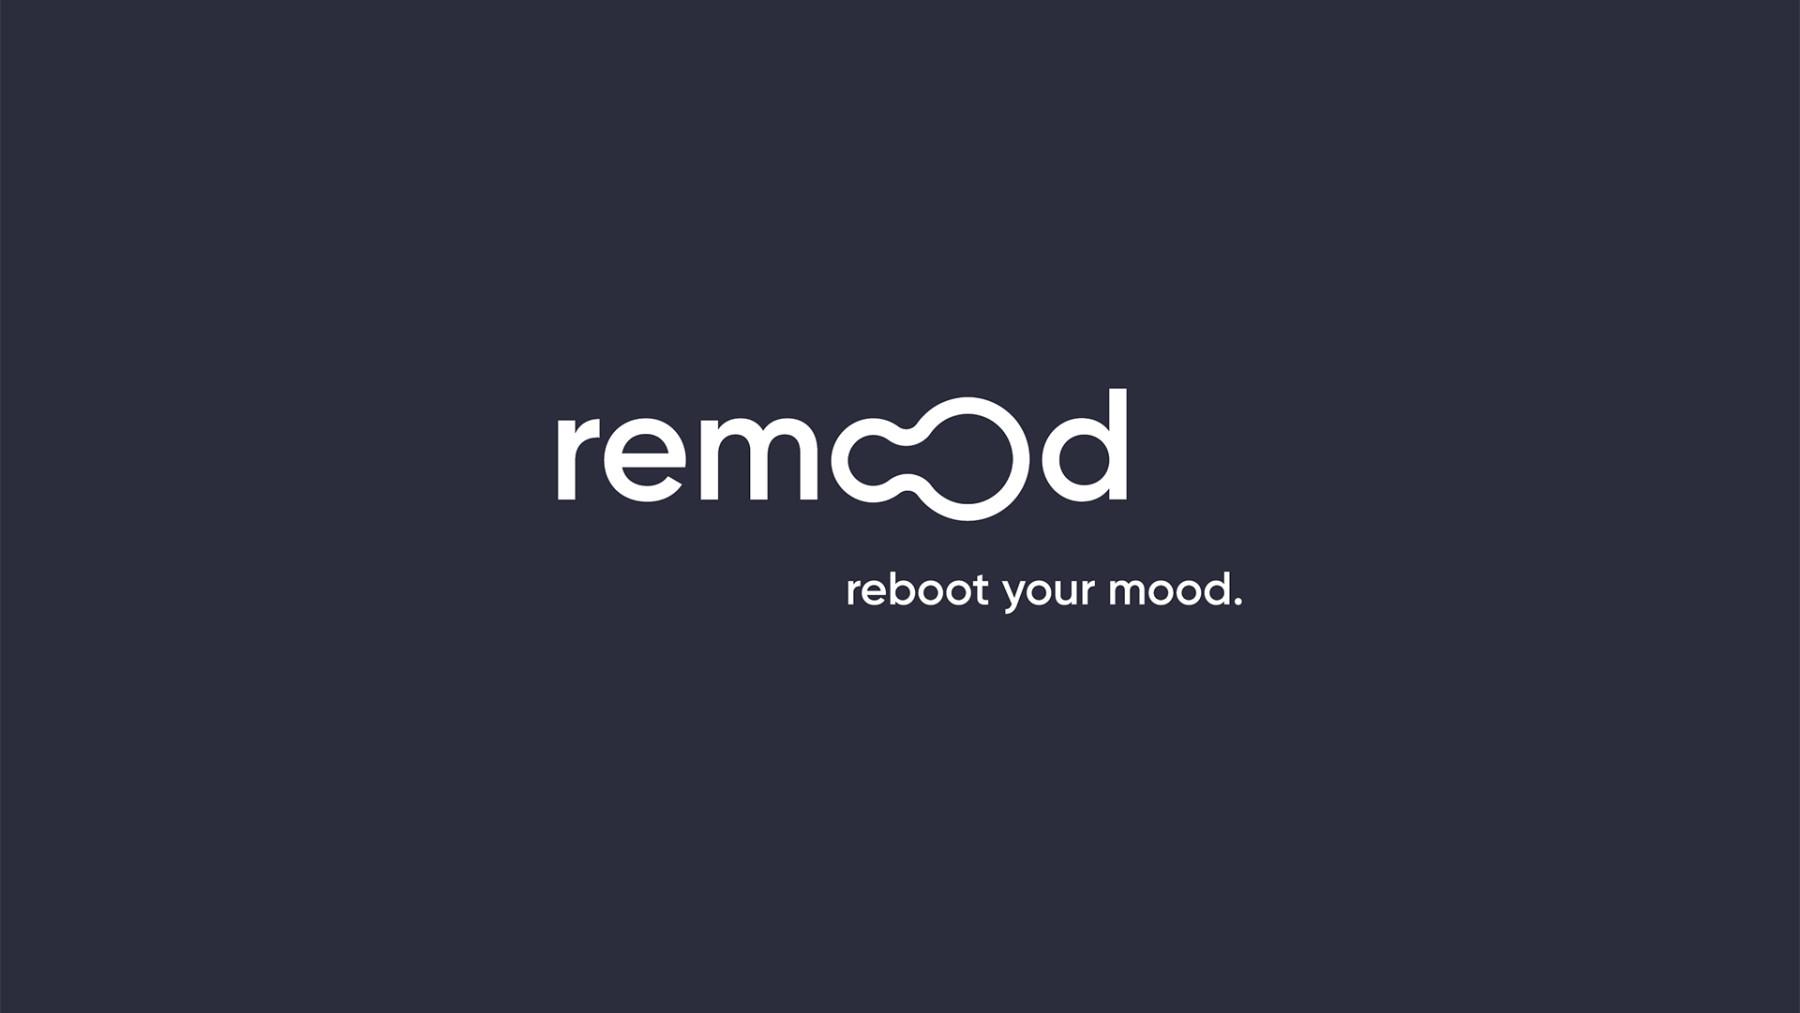 Nixdorf_Ina_Logo_remood_20170721